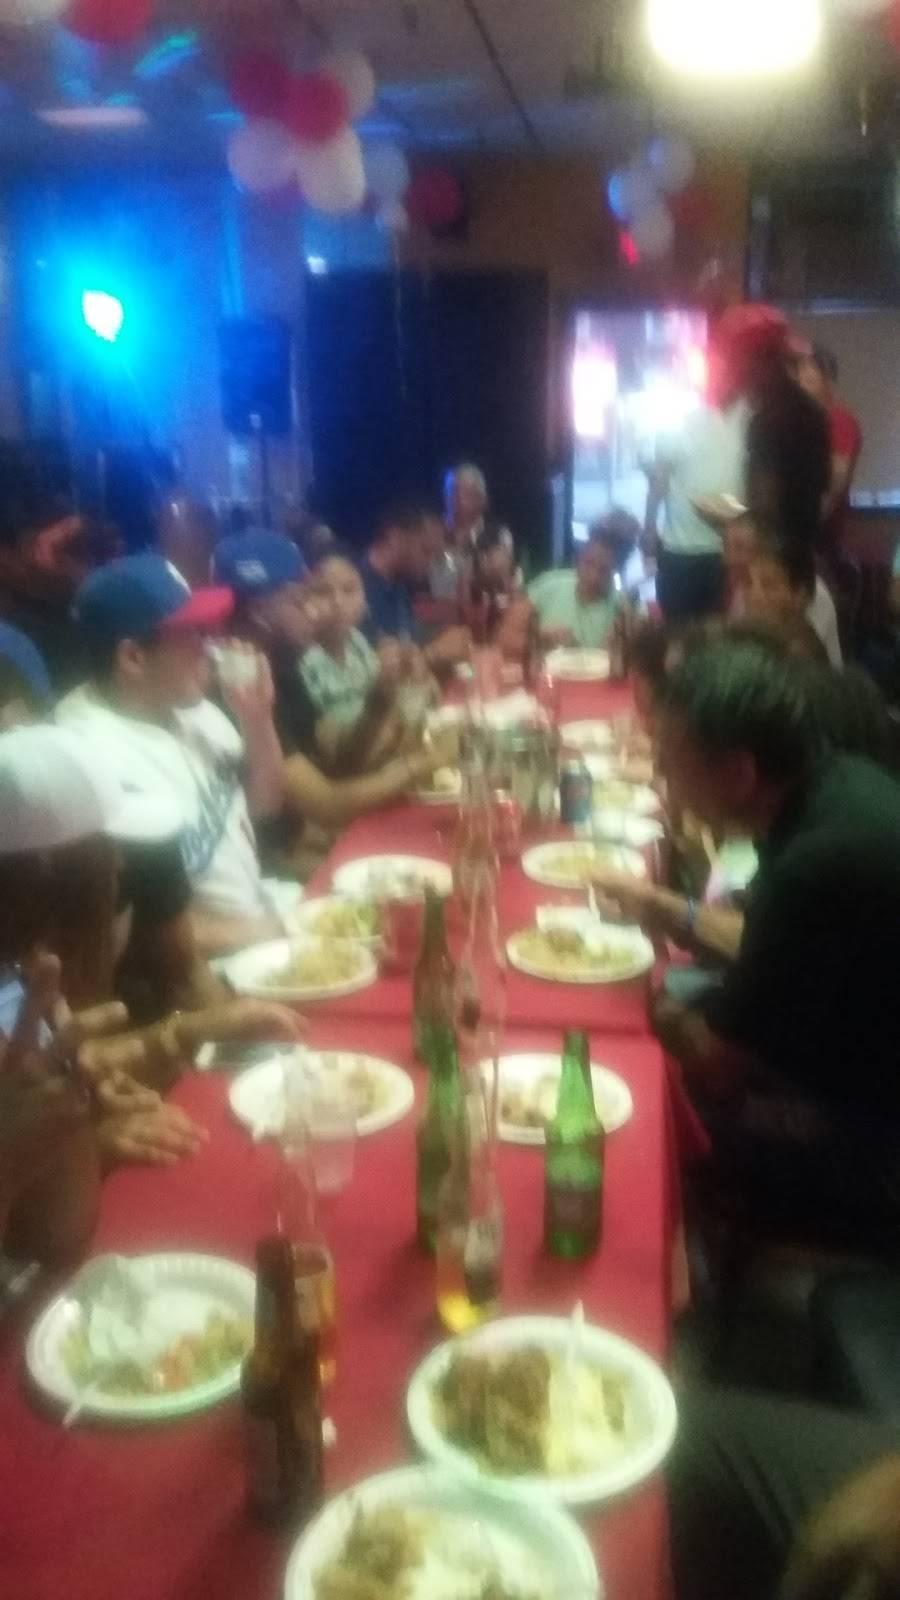 El Cuco Restaurant | restaurant | 514 John F. Kennedy Blvd, Union City, NJ 07087, USA | 2018677004 OR +1 201-867-7004